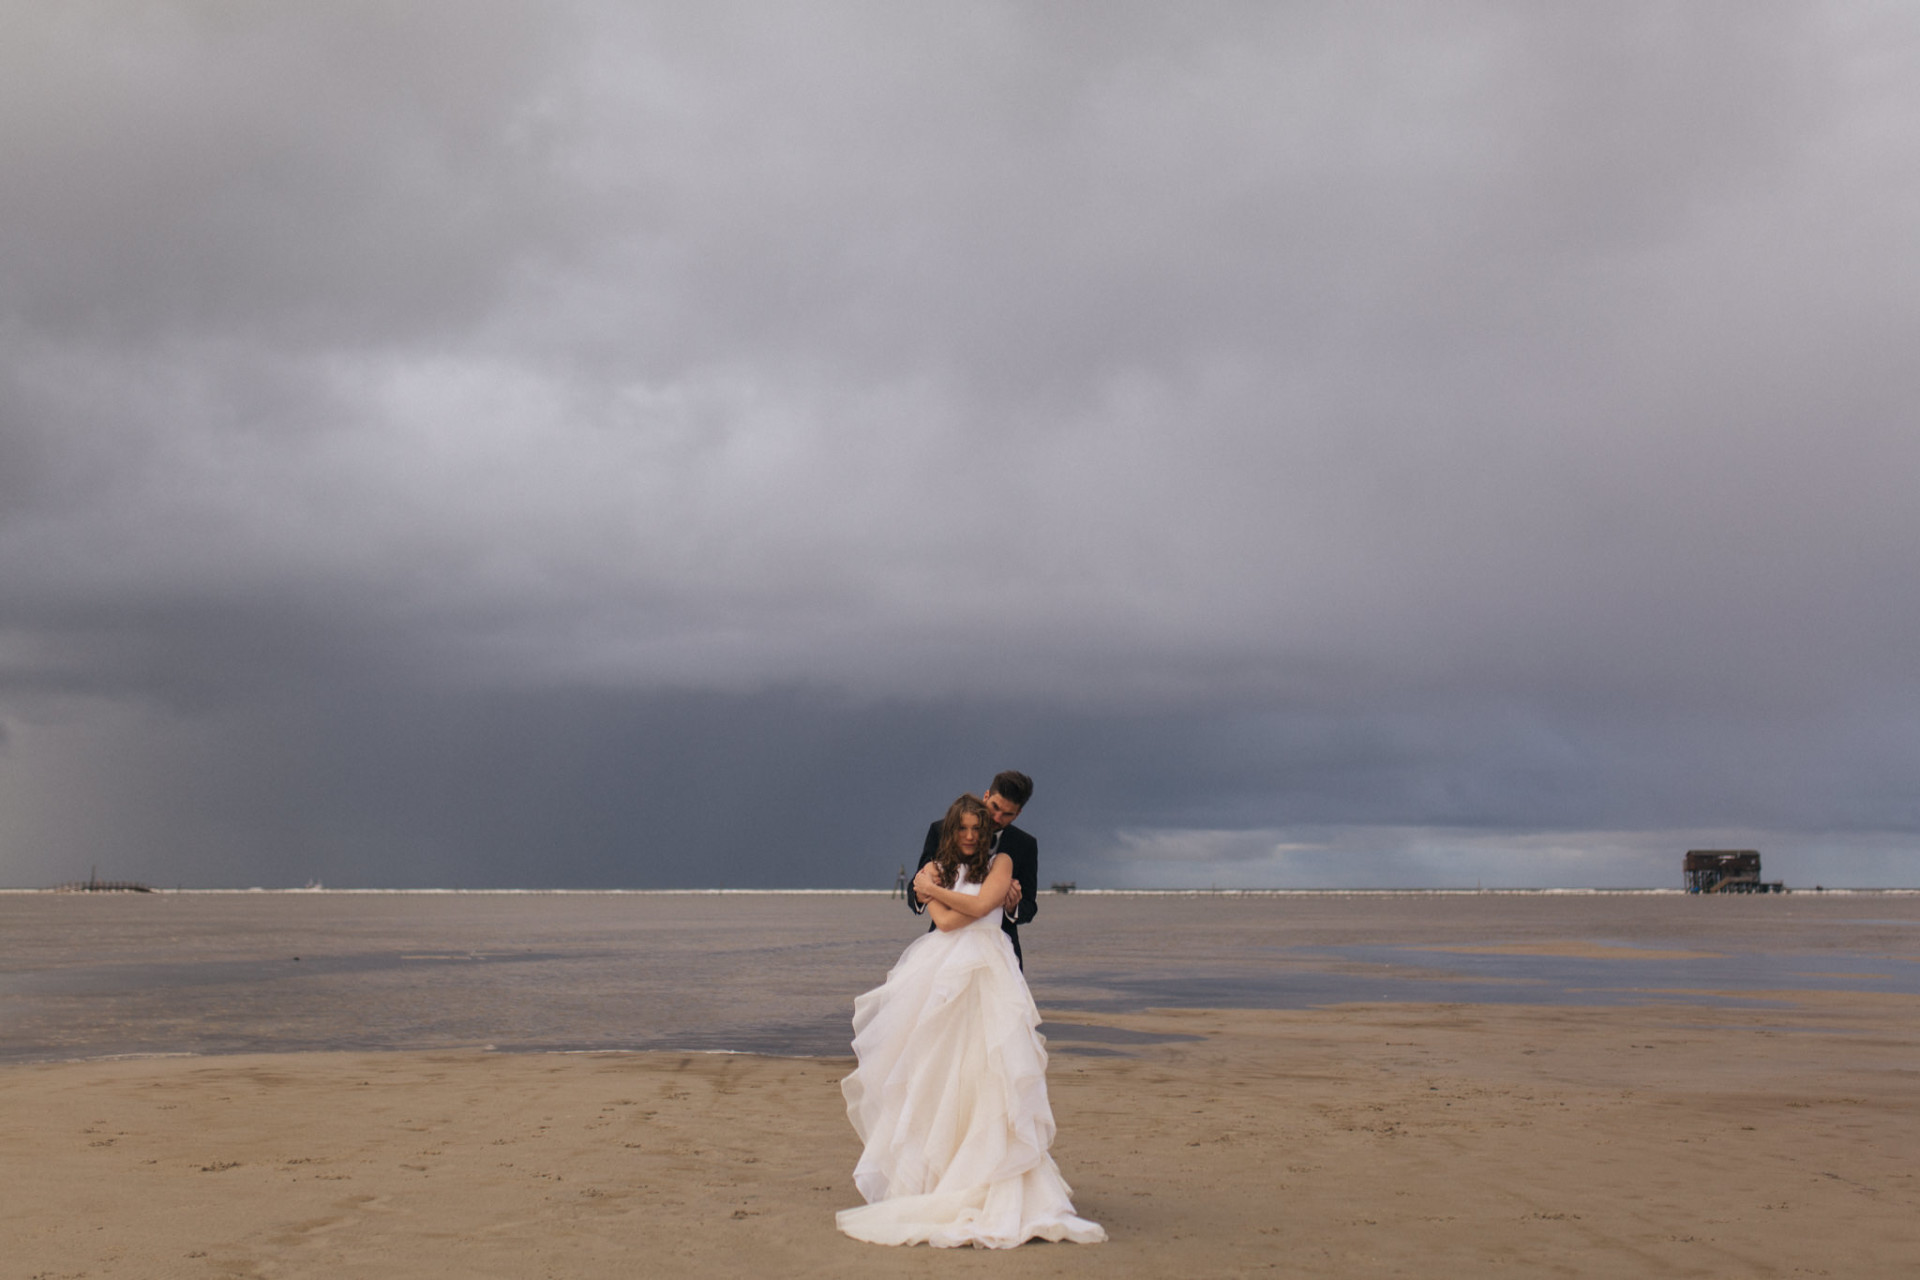 elopement photographer germany-elopement europe beach